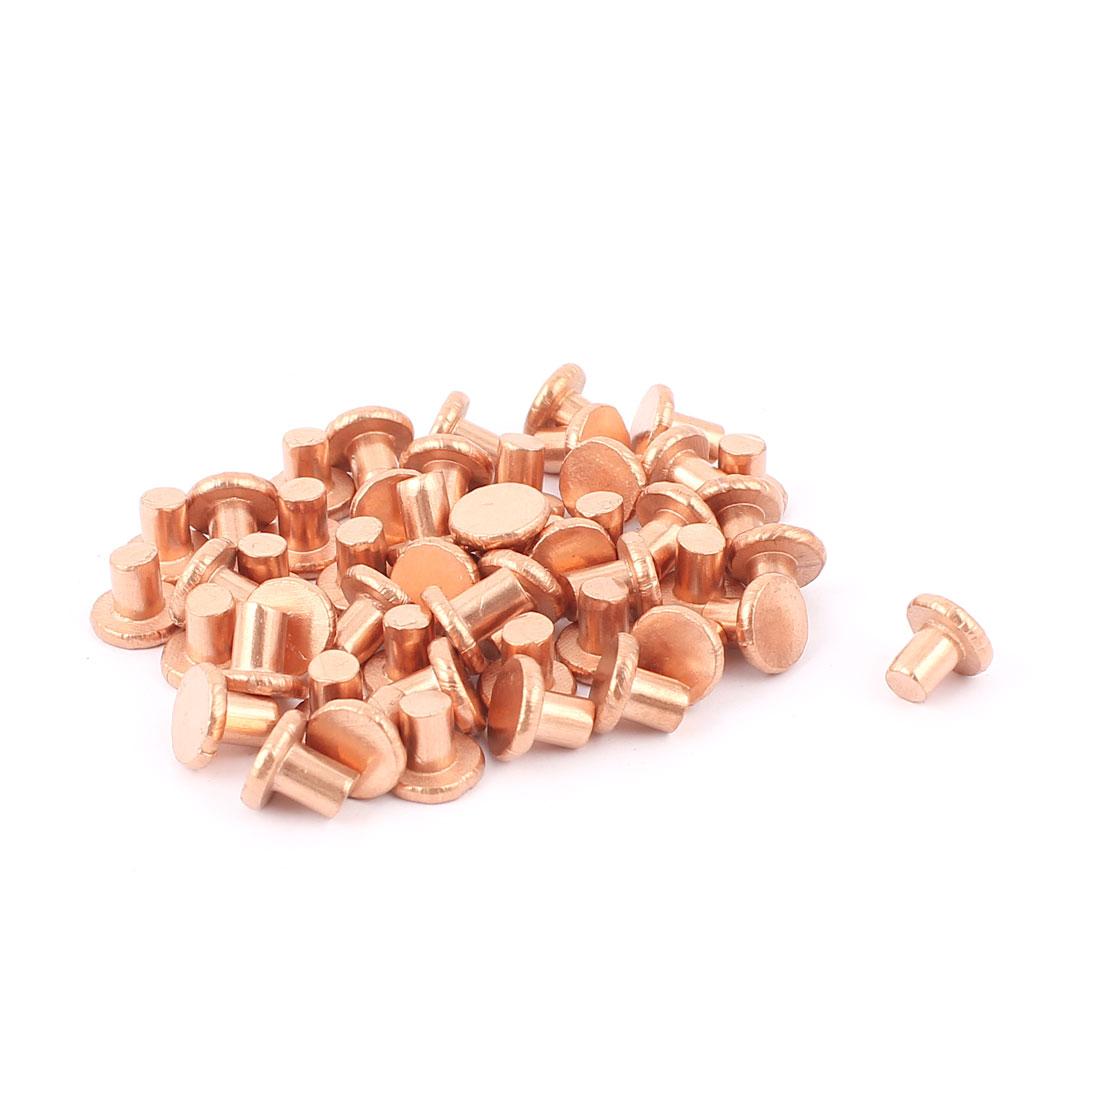 "50 Pcs 13/64"" Diameter 15/64"" Long Shank Flat Head Bolts Copper Solid Rivets Fasteners"